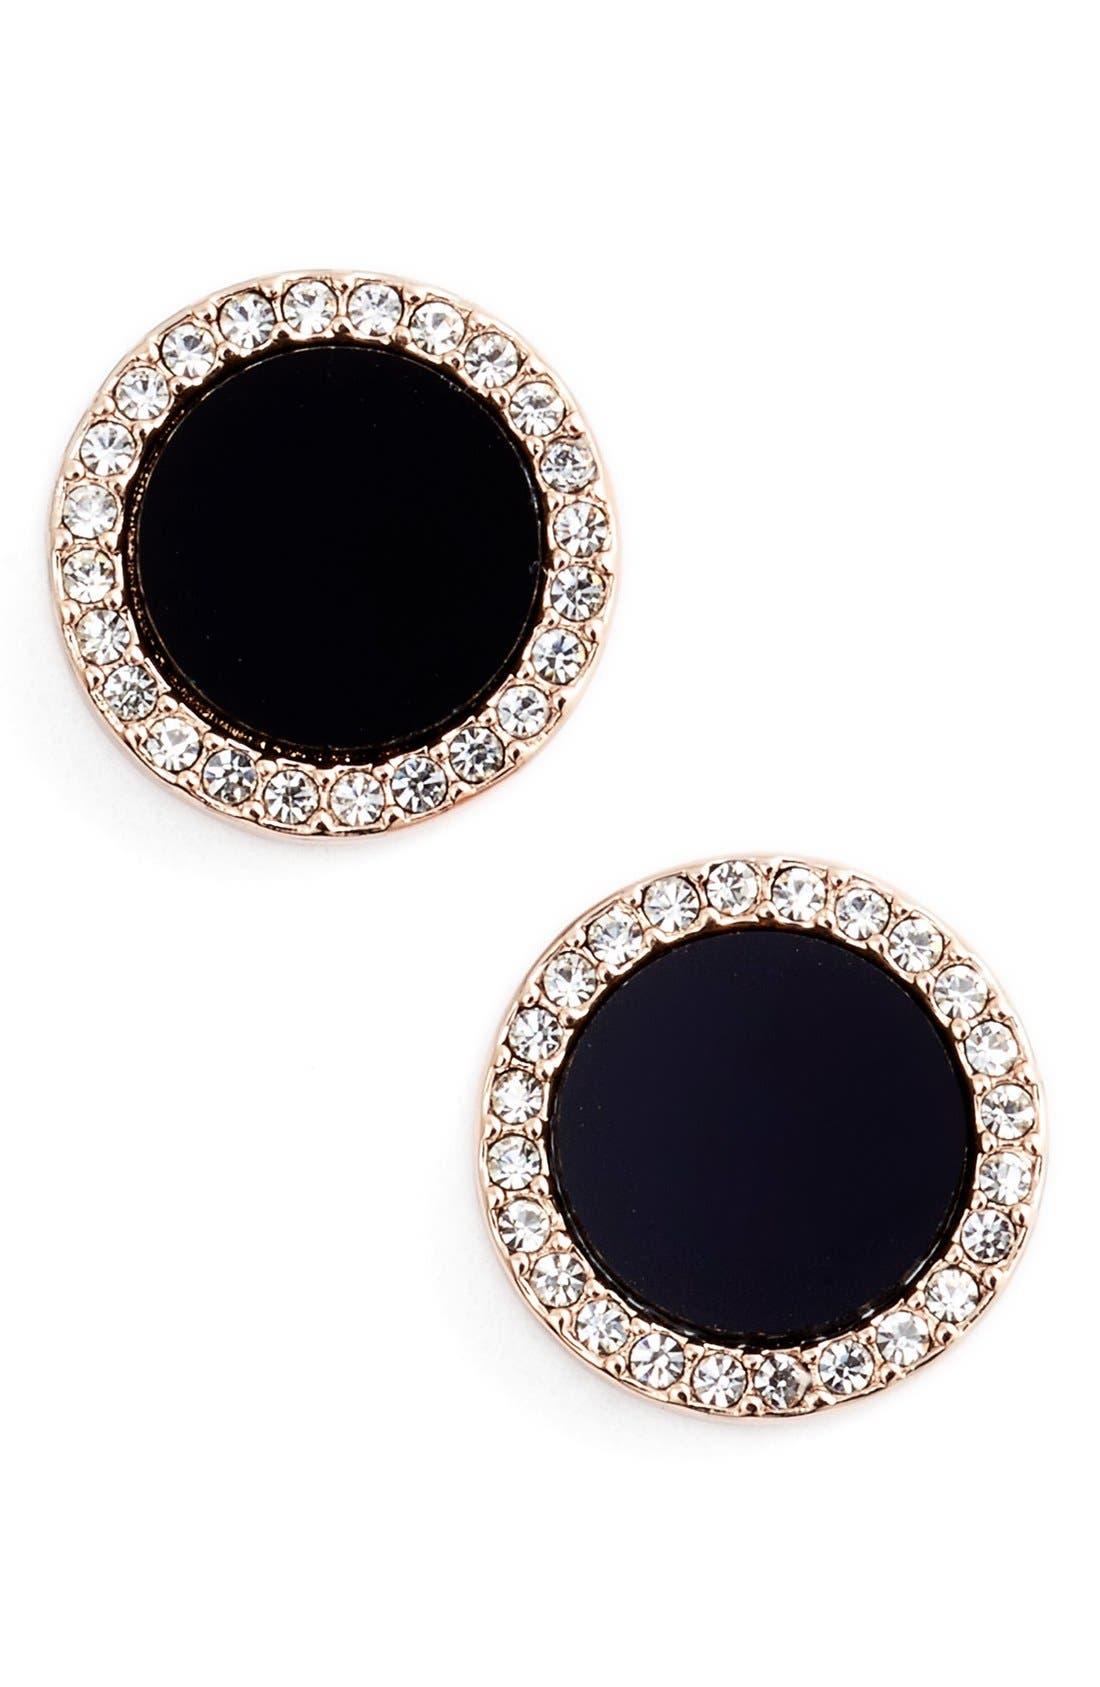 Alternate Image 1 Selected - kate spade new york 'in the spotlight' circular stud earrings